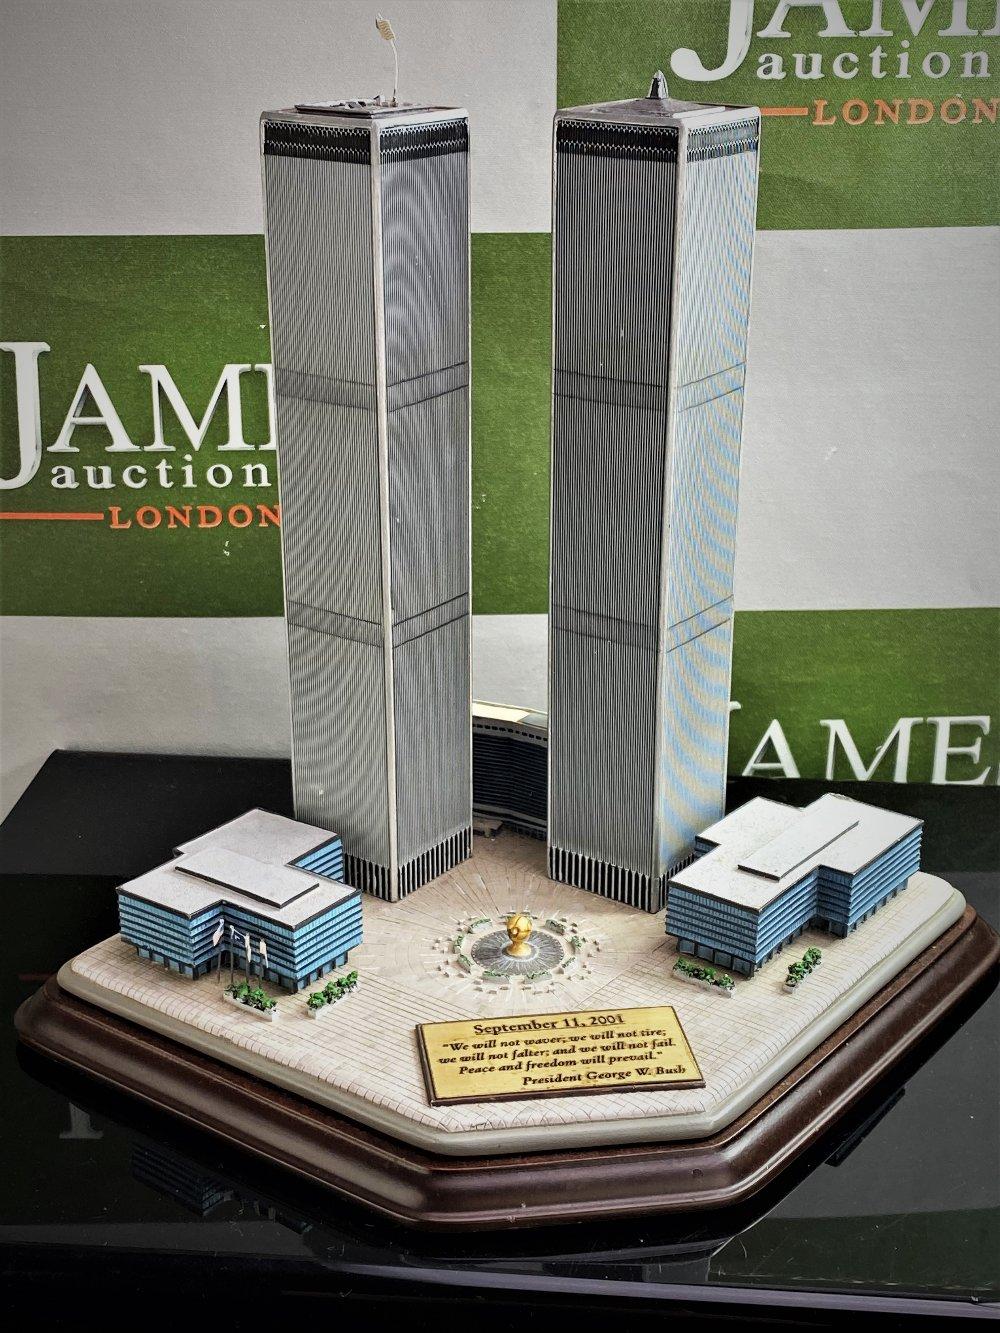 Danbury Mint September 11, 2001 9/11: Twin Towers Historic Desk Top Diarama - Image 5 of 6